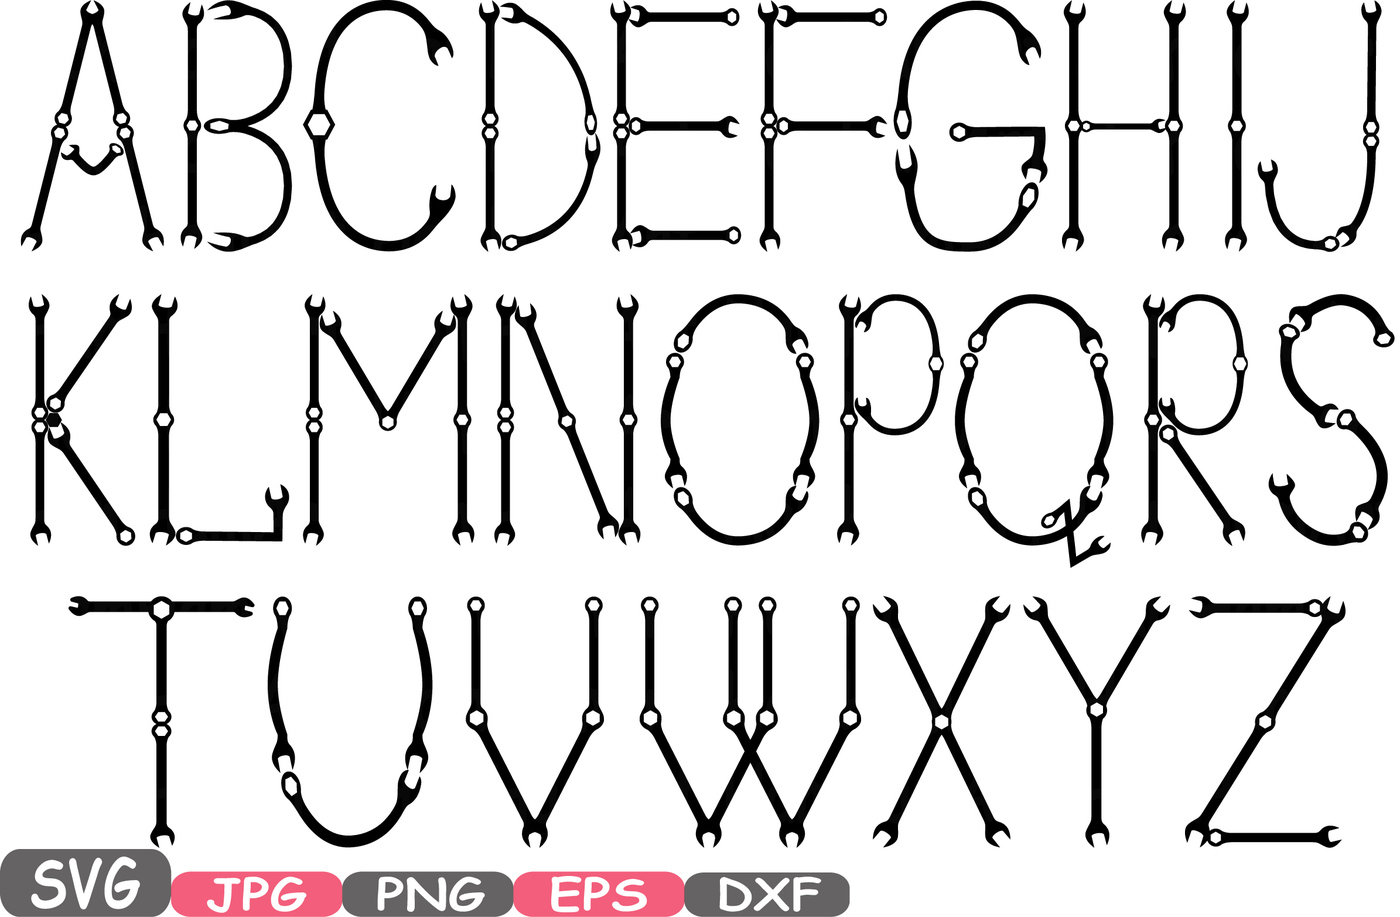 Abc clipart icon. Mechanic tools alphabet svg